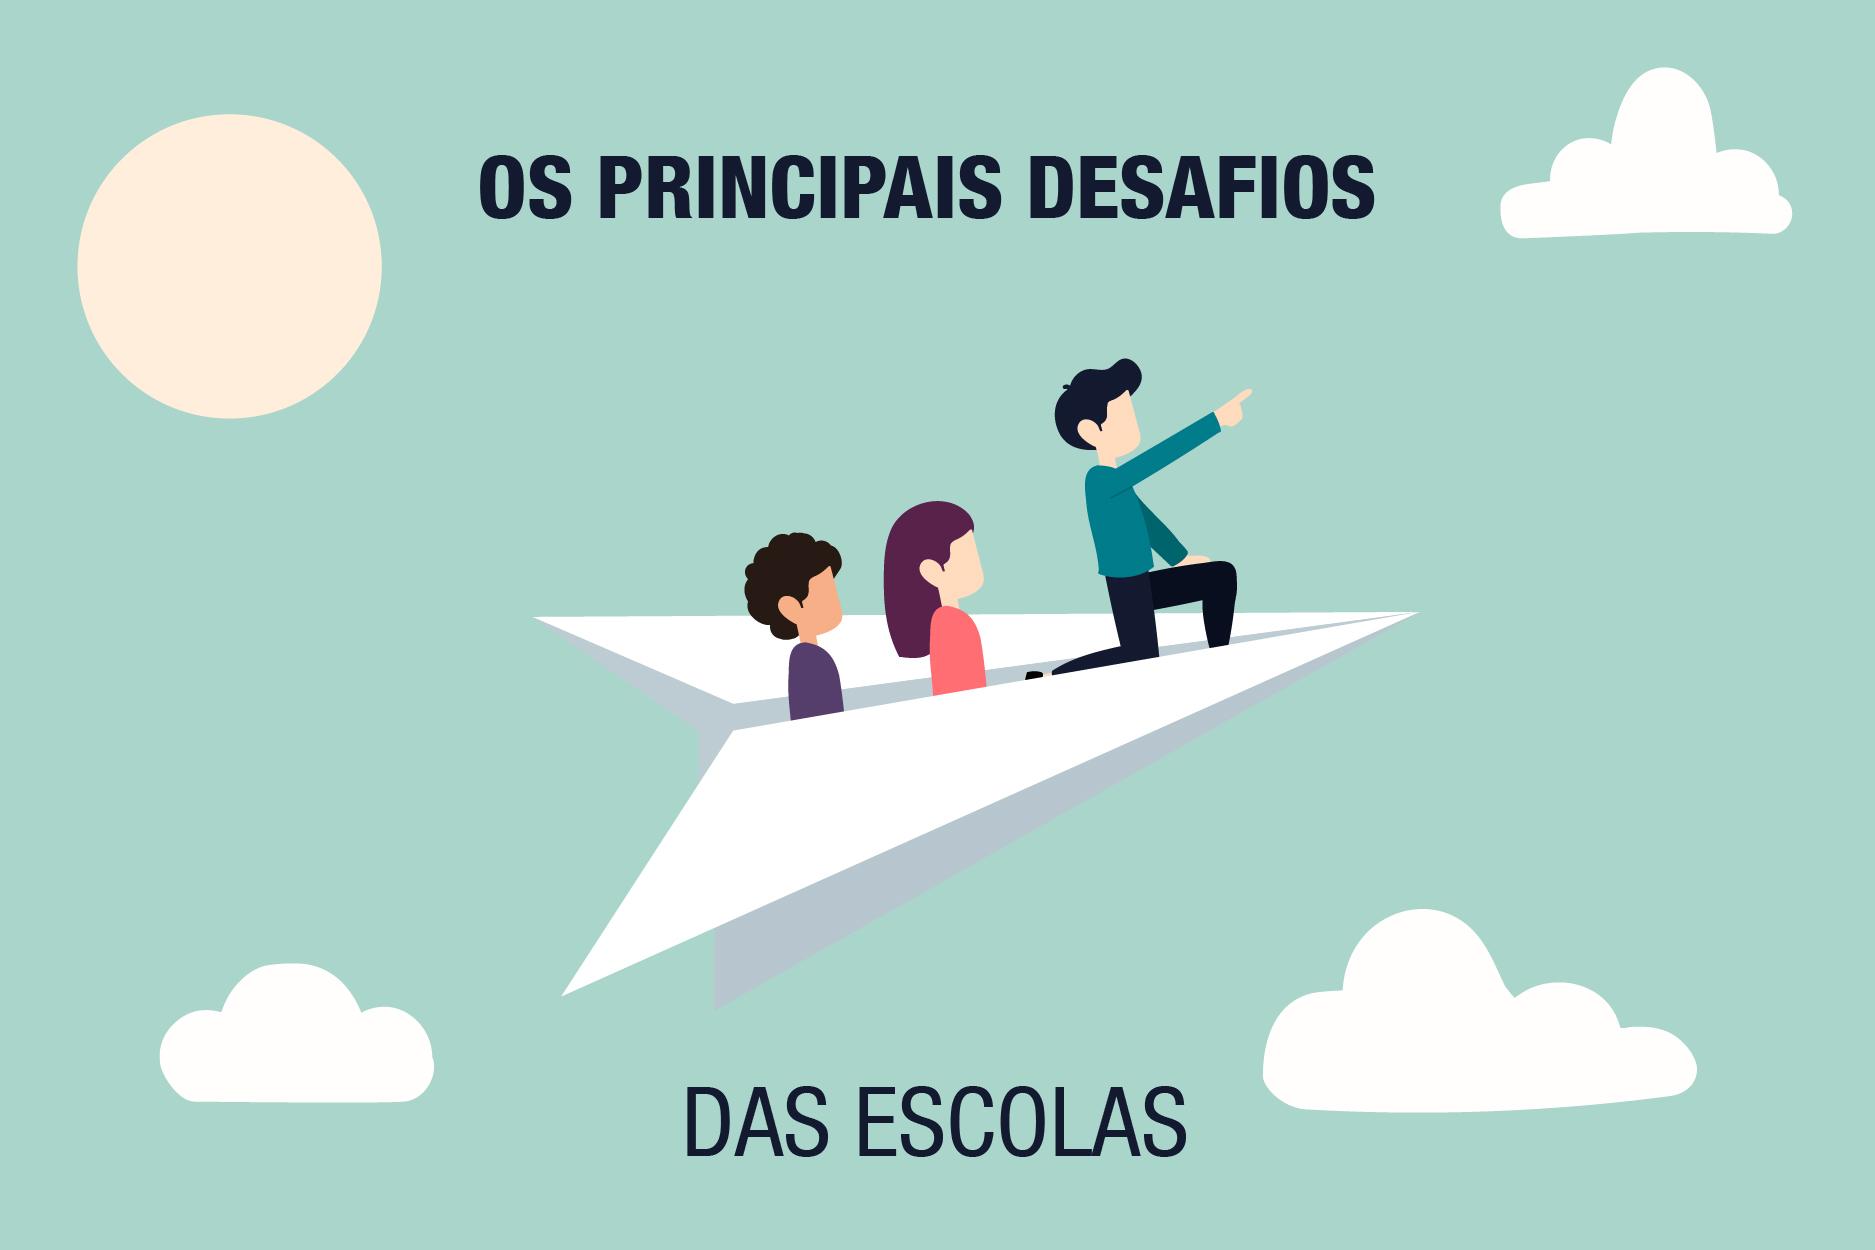 OS PRINCIPAIS DESAFIOS DAS ESCOLAS